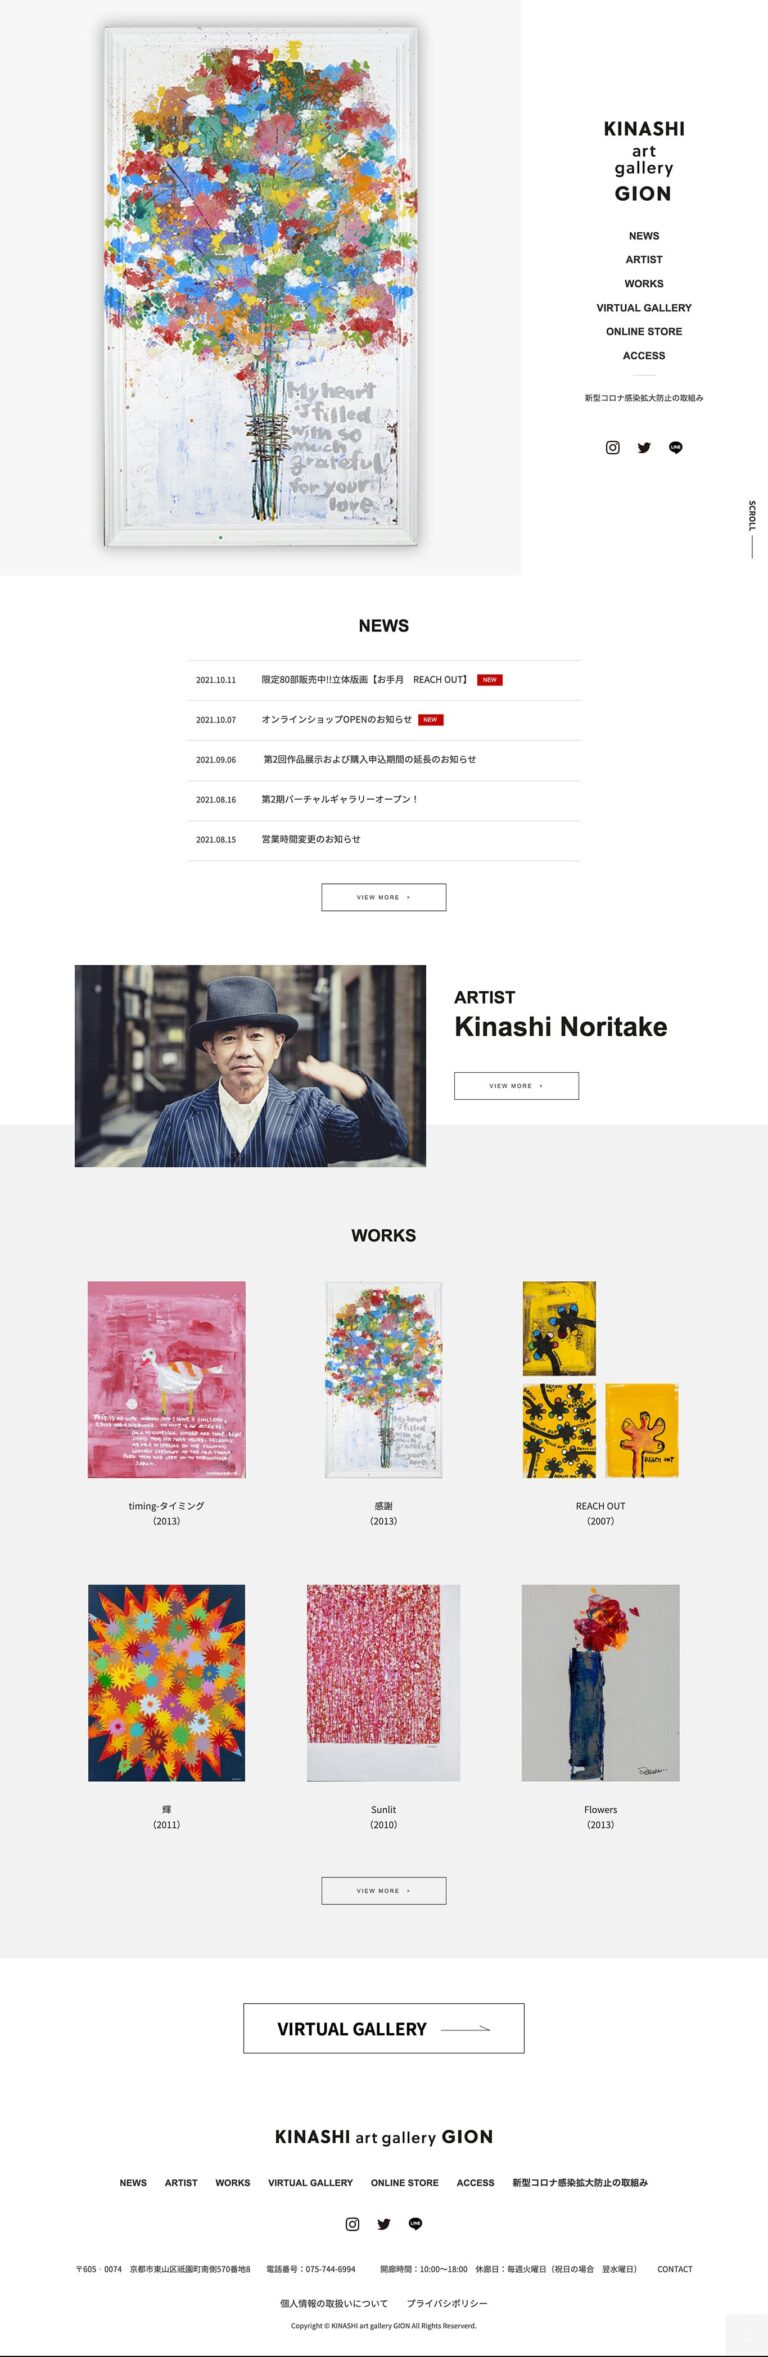 KINASHI art gallery GION